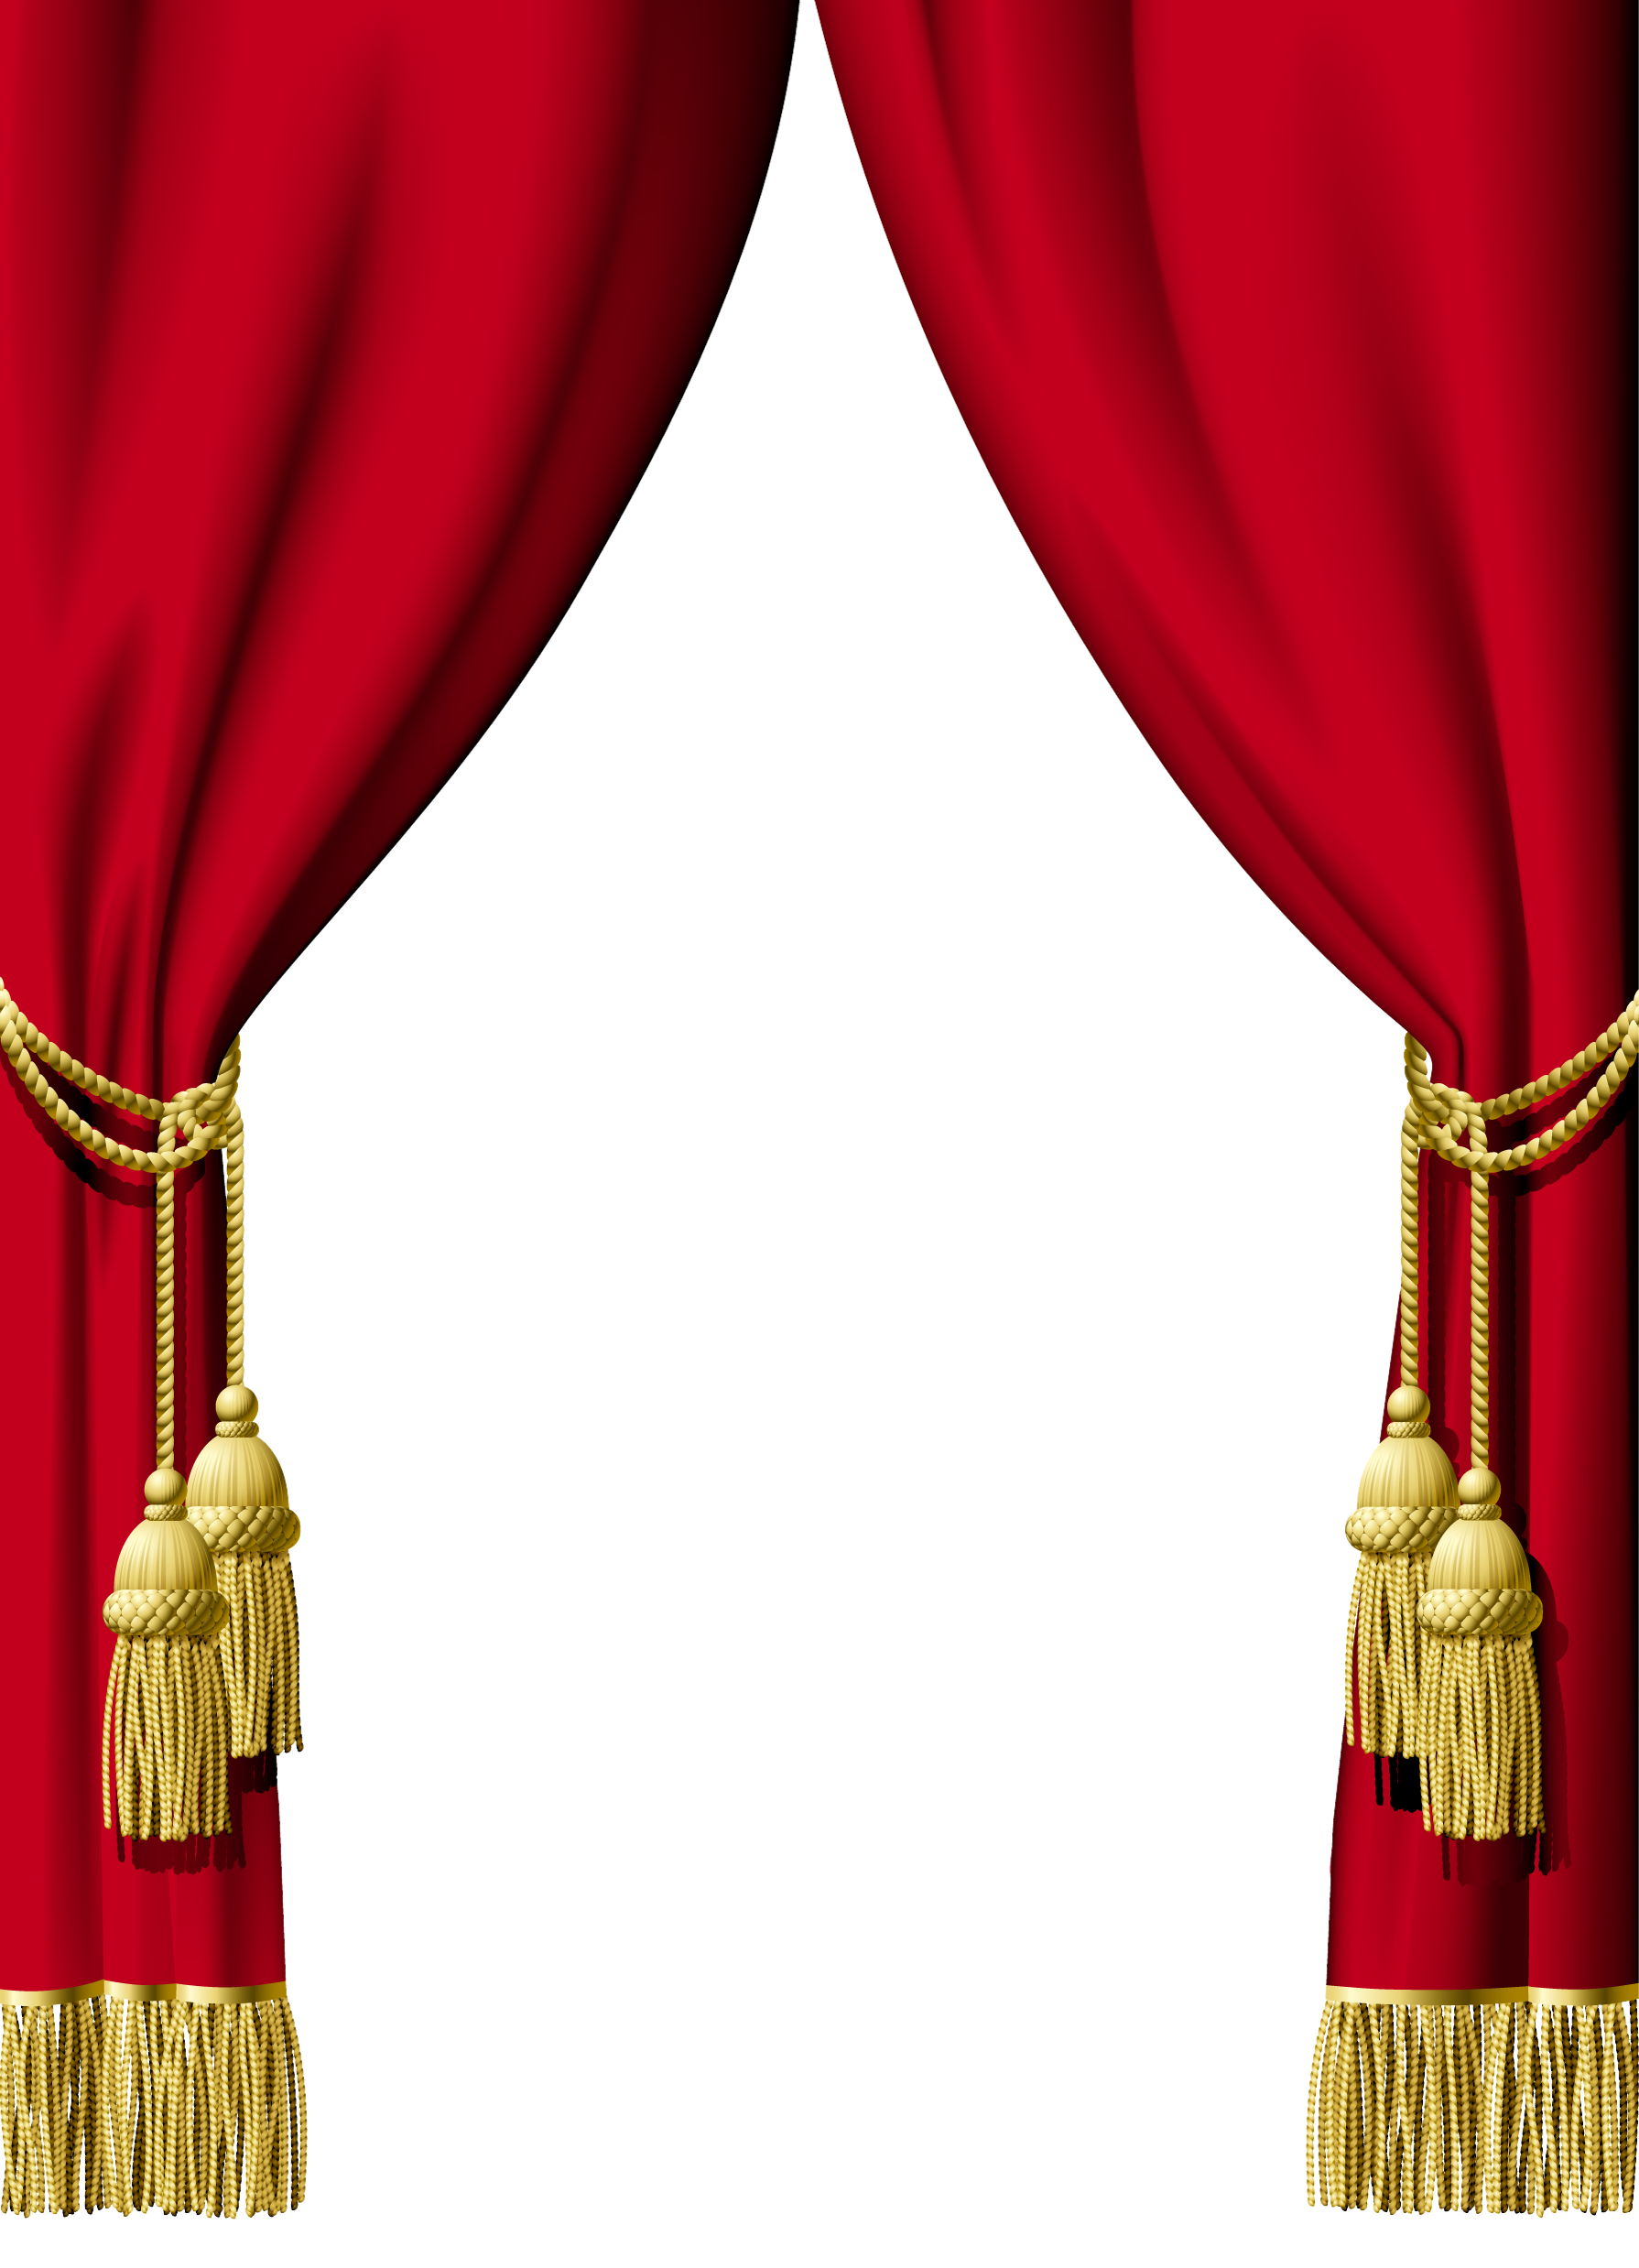 Curtains clipart dinner theatre. Curtain design graphics illustrations